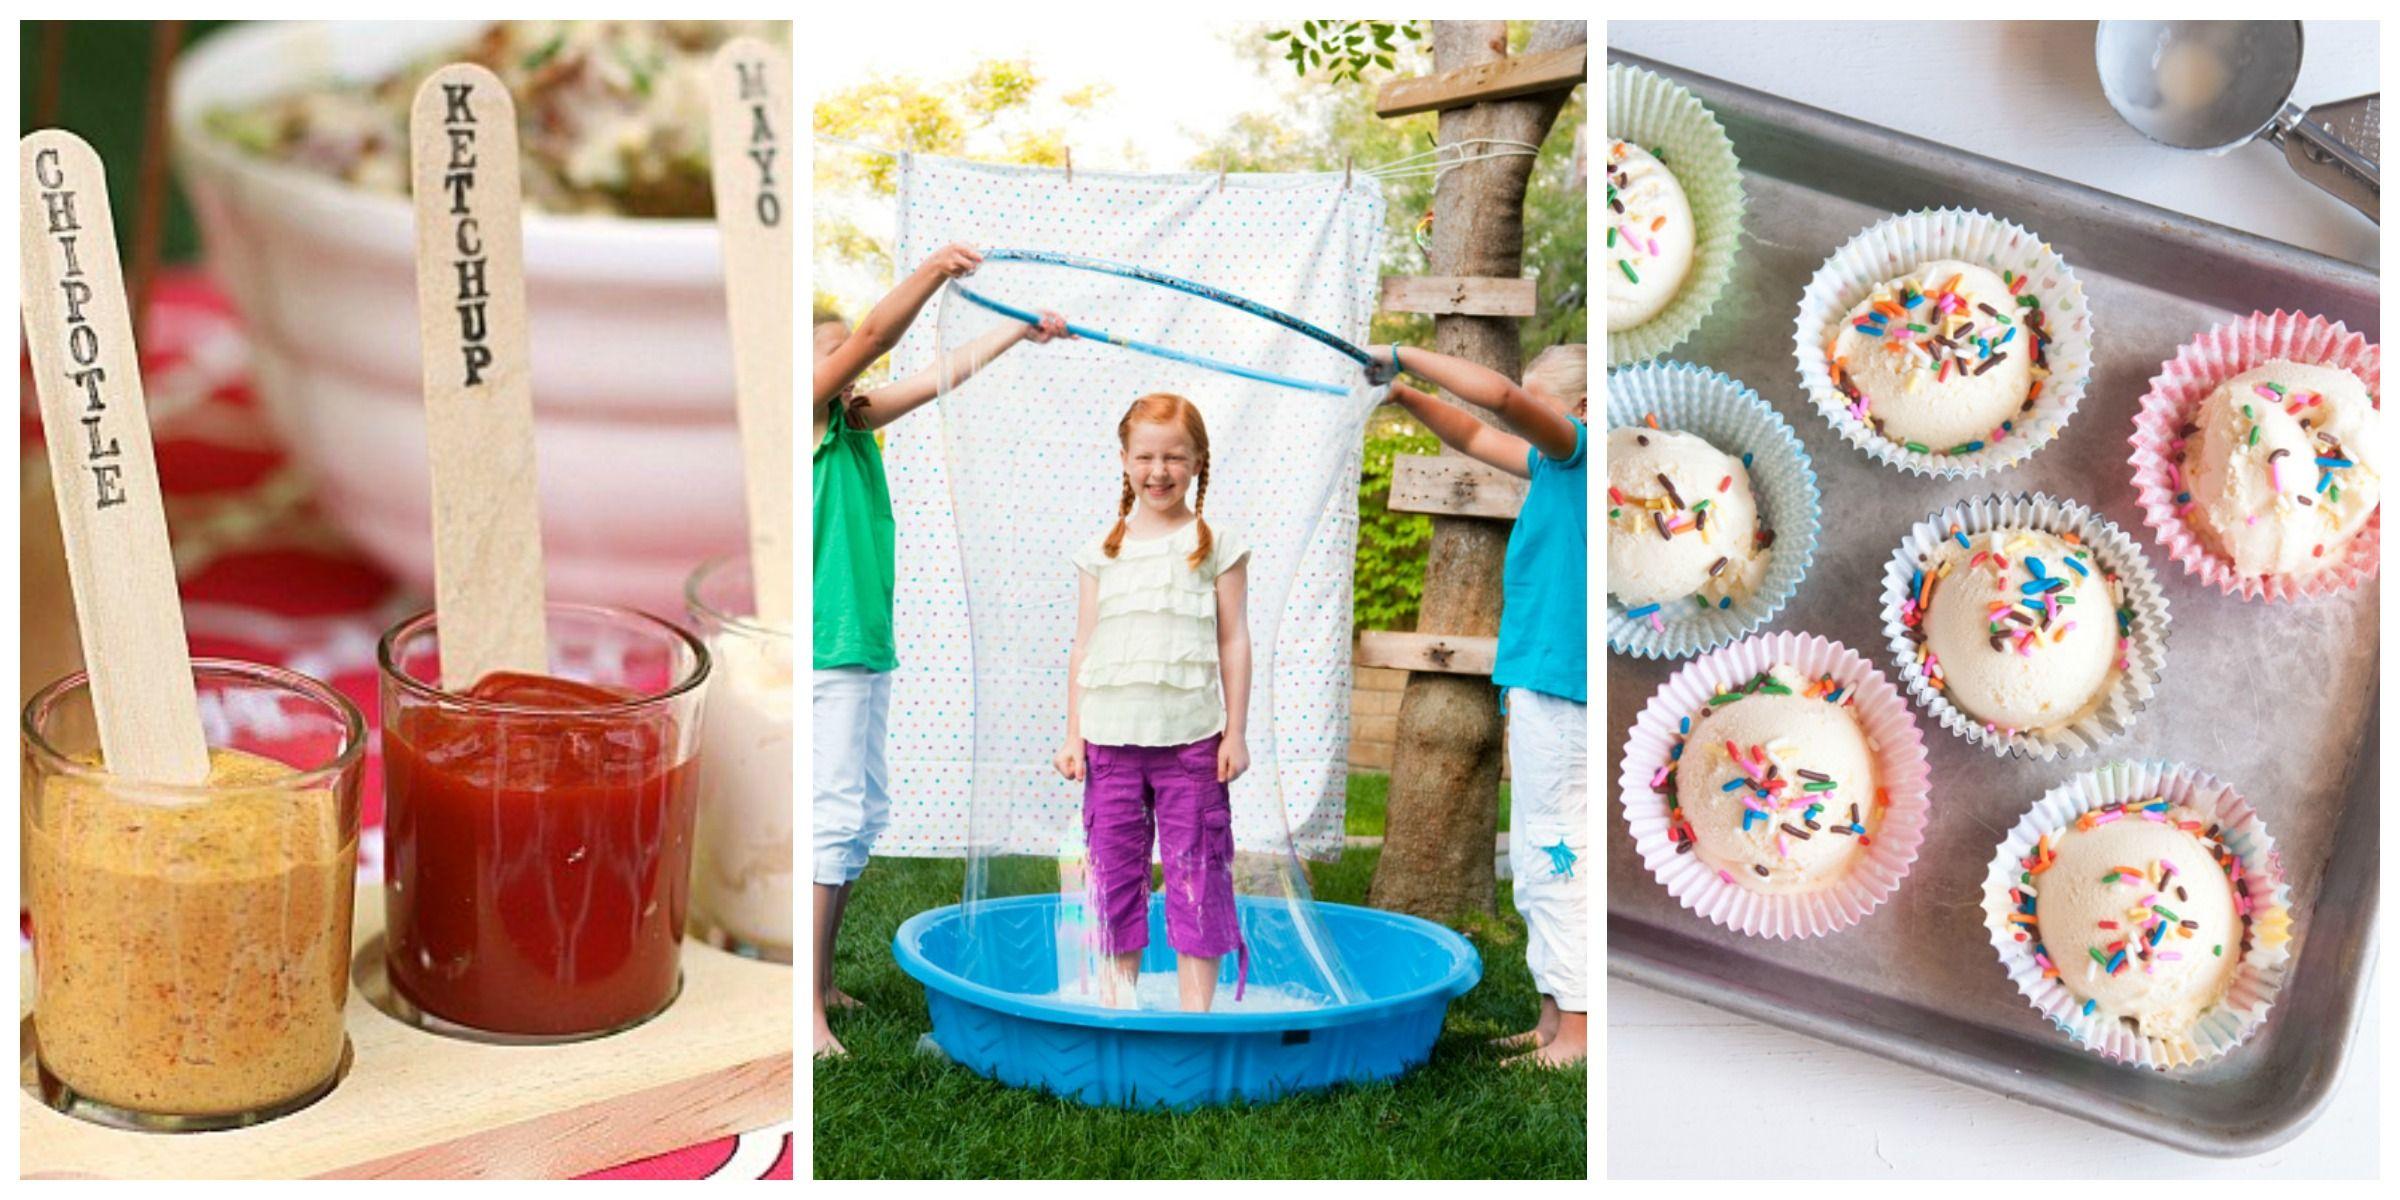 30 genius backyard barbecue ideas backyard bbq summer parties